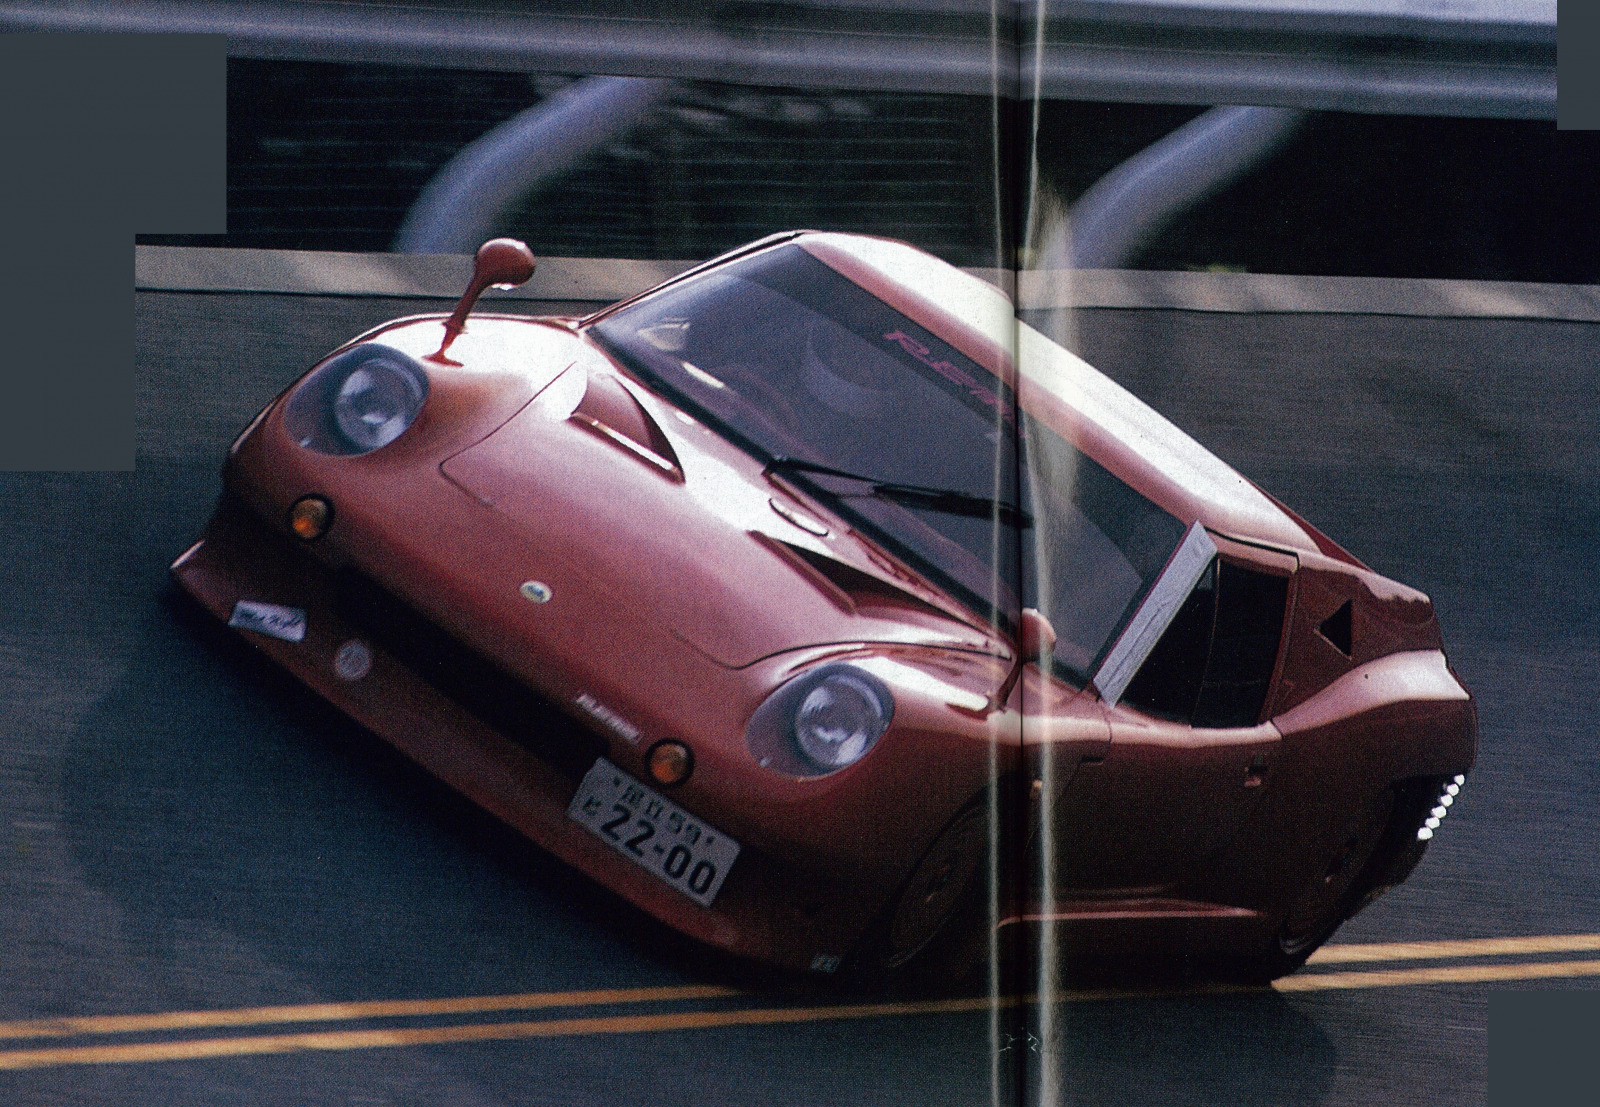 「RE雨宮ロータスヨーロッパ改13Bペリは、今見ても異次元のスーパーマシン【OPTION 1987年7月号より】」の3枚目の画像